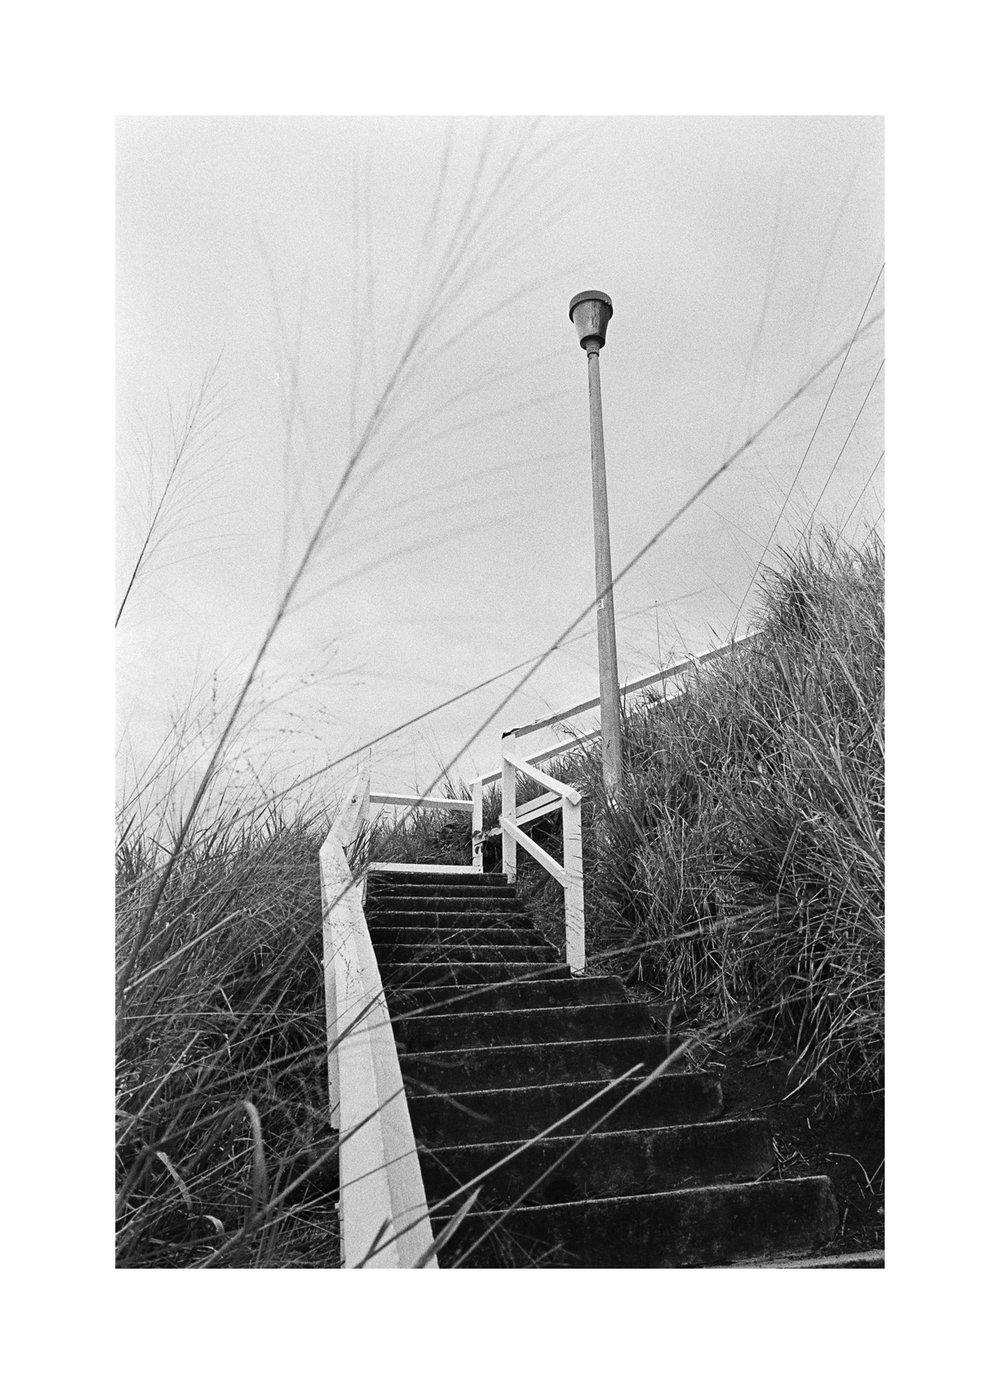 2018106 - Roll 252 - 029-Nick-Bedford,-Photographer-Black and White, Kodak TRI-X 400, Landscape Photography, Leica M7, Shorncliffe, Voigtlander 35mm F1.7.jpg